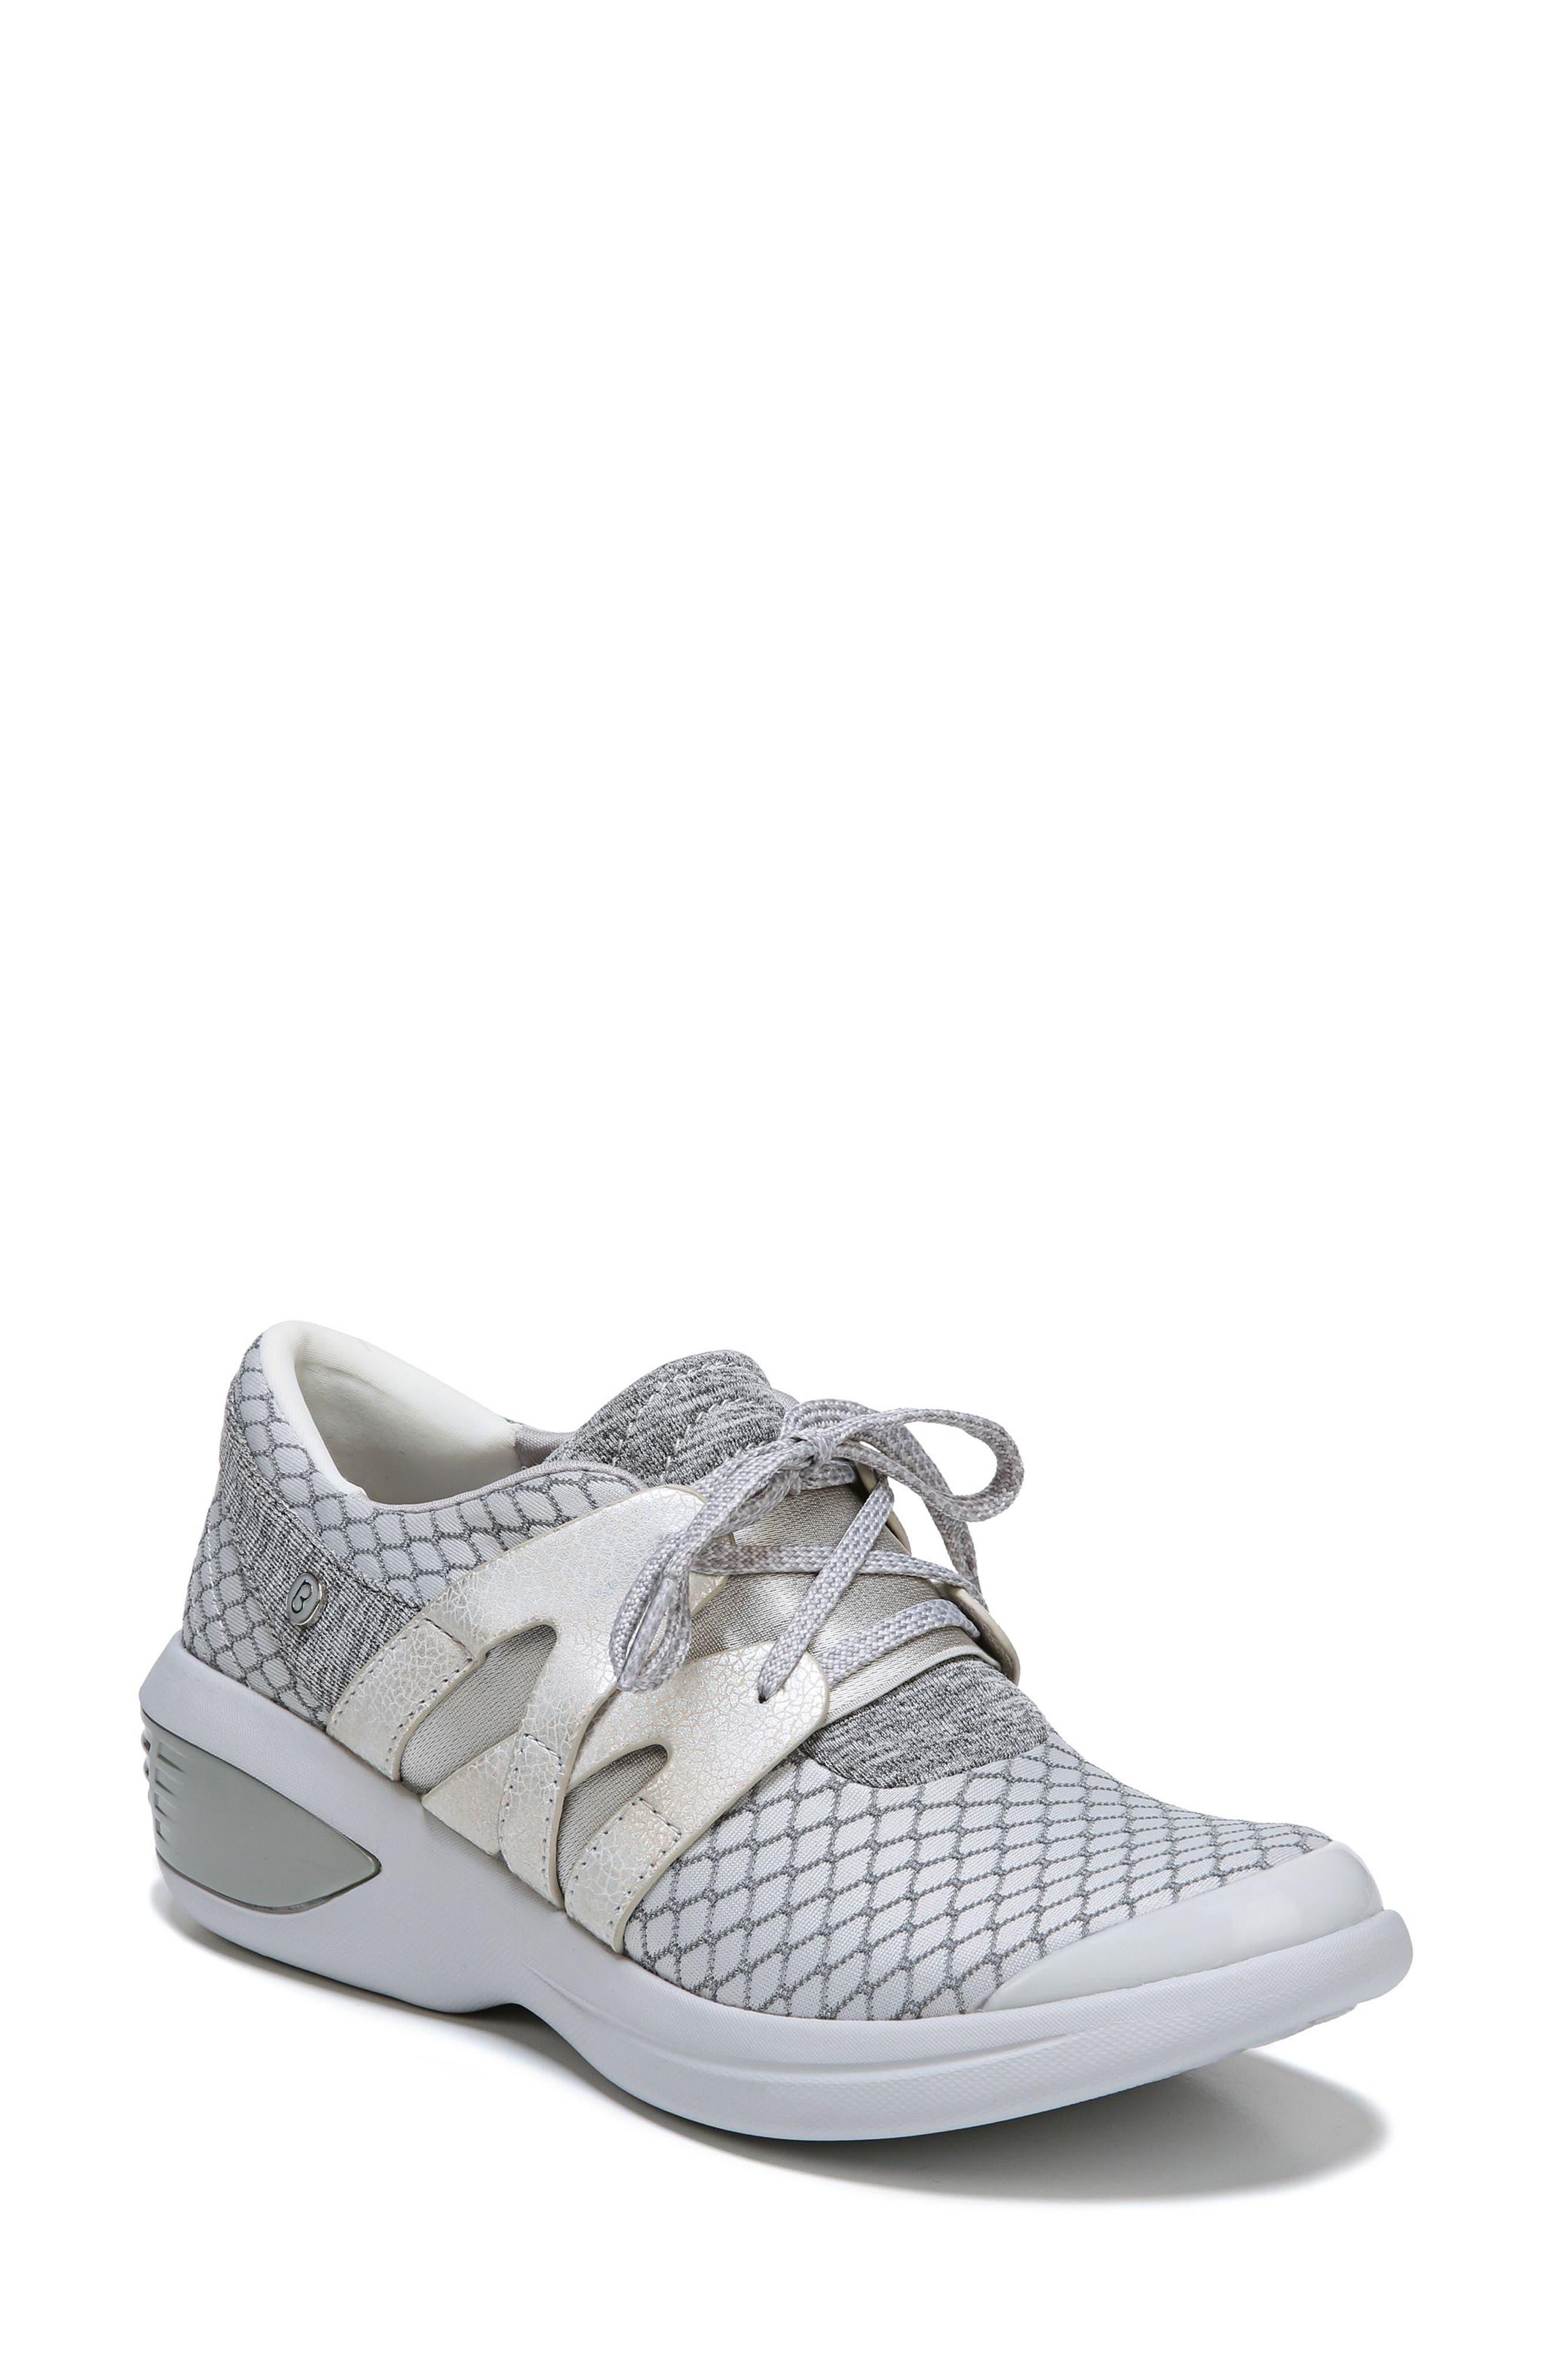 Alternate Image 1 Selected - BZees Flicker Sneaker (Women)